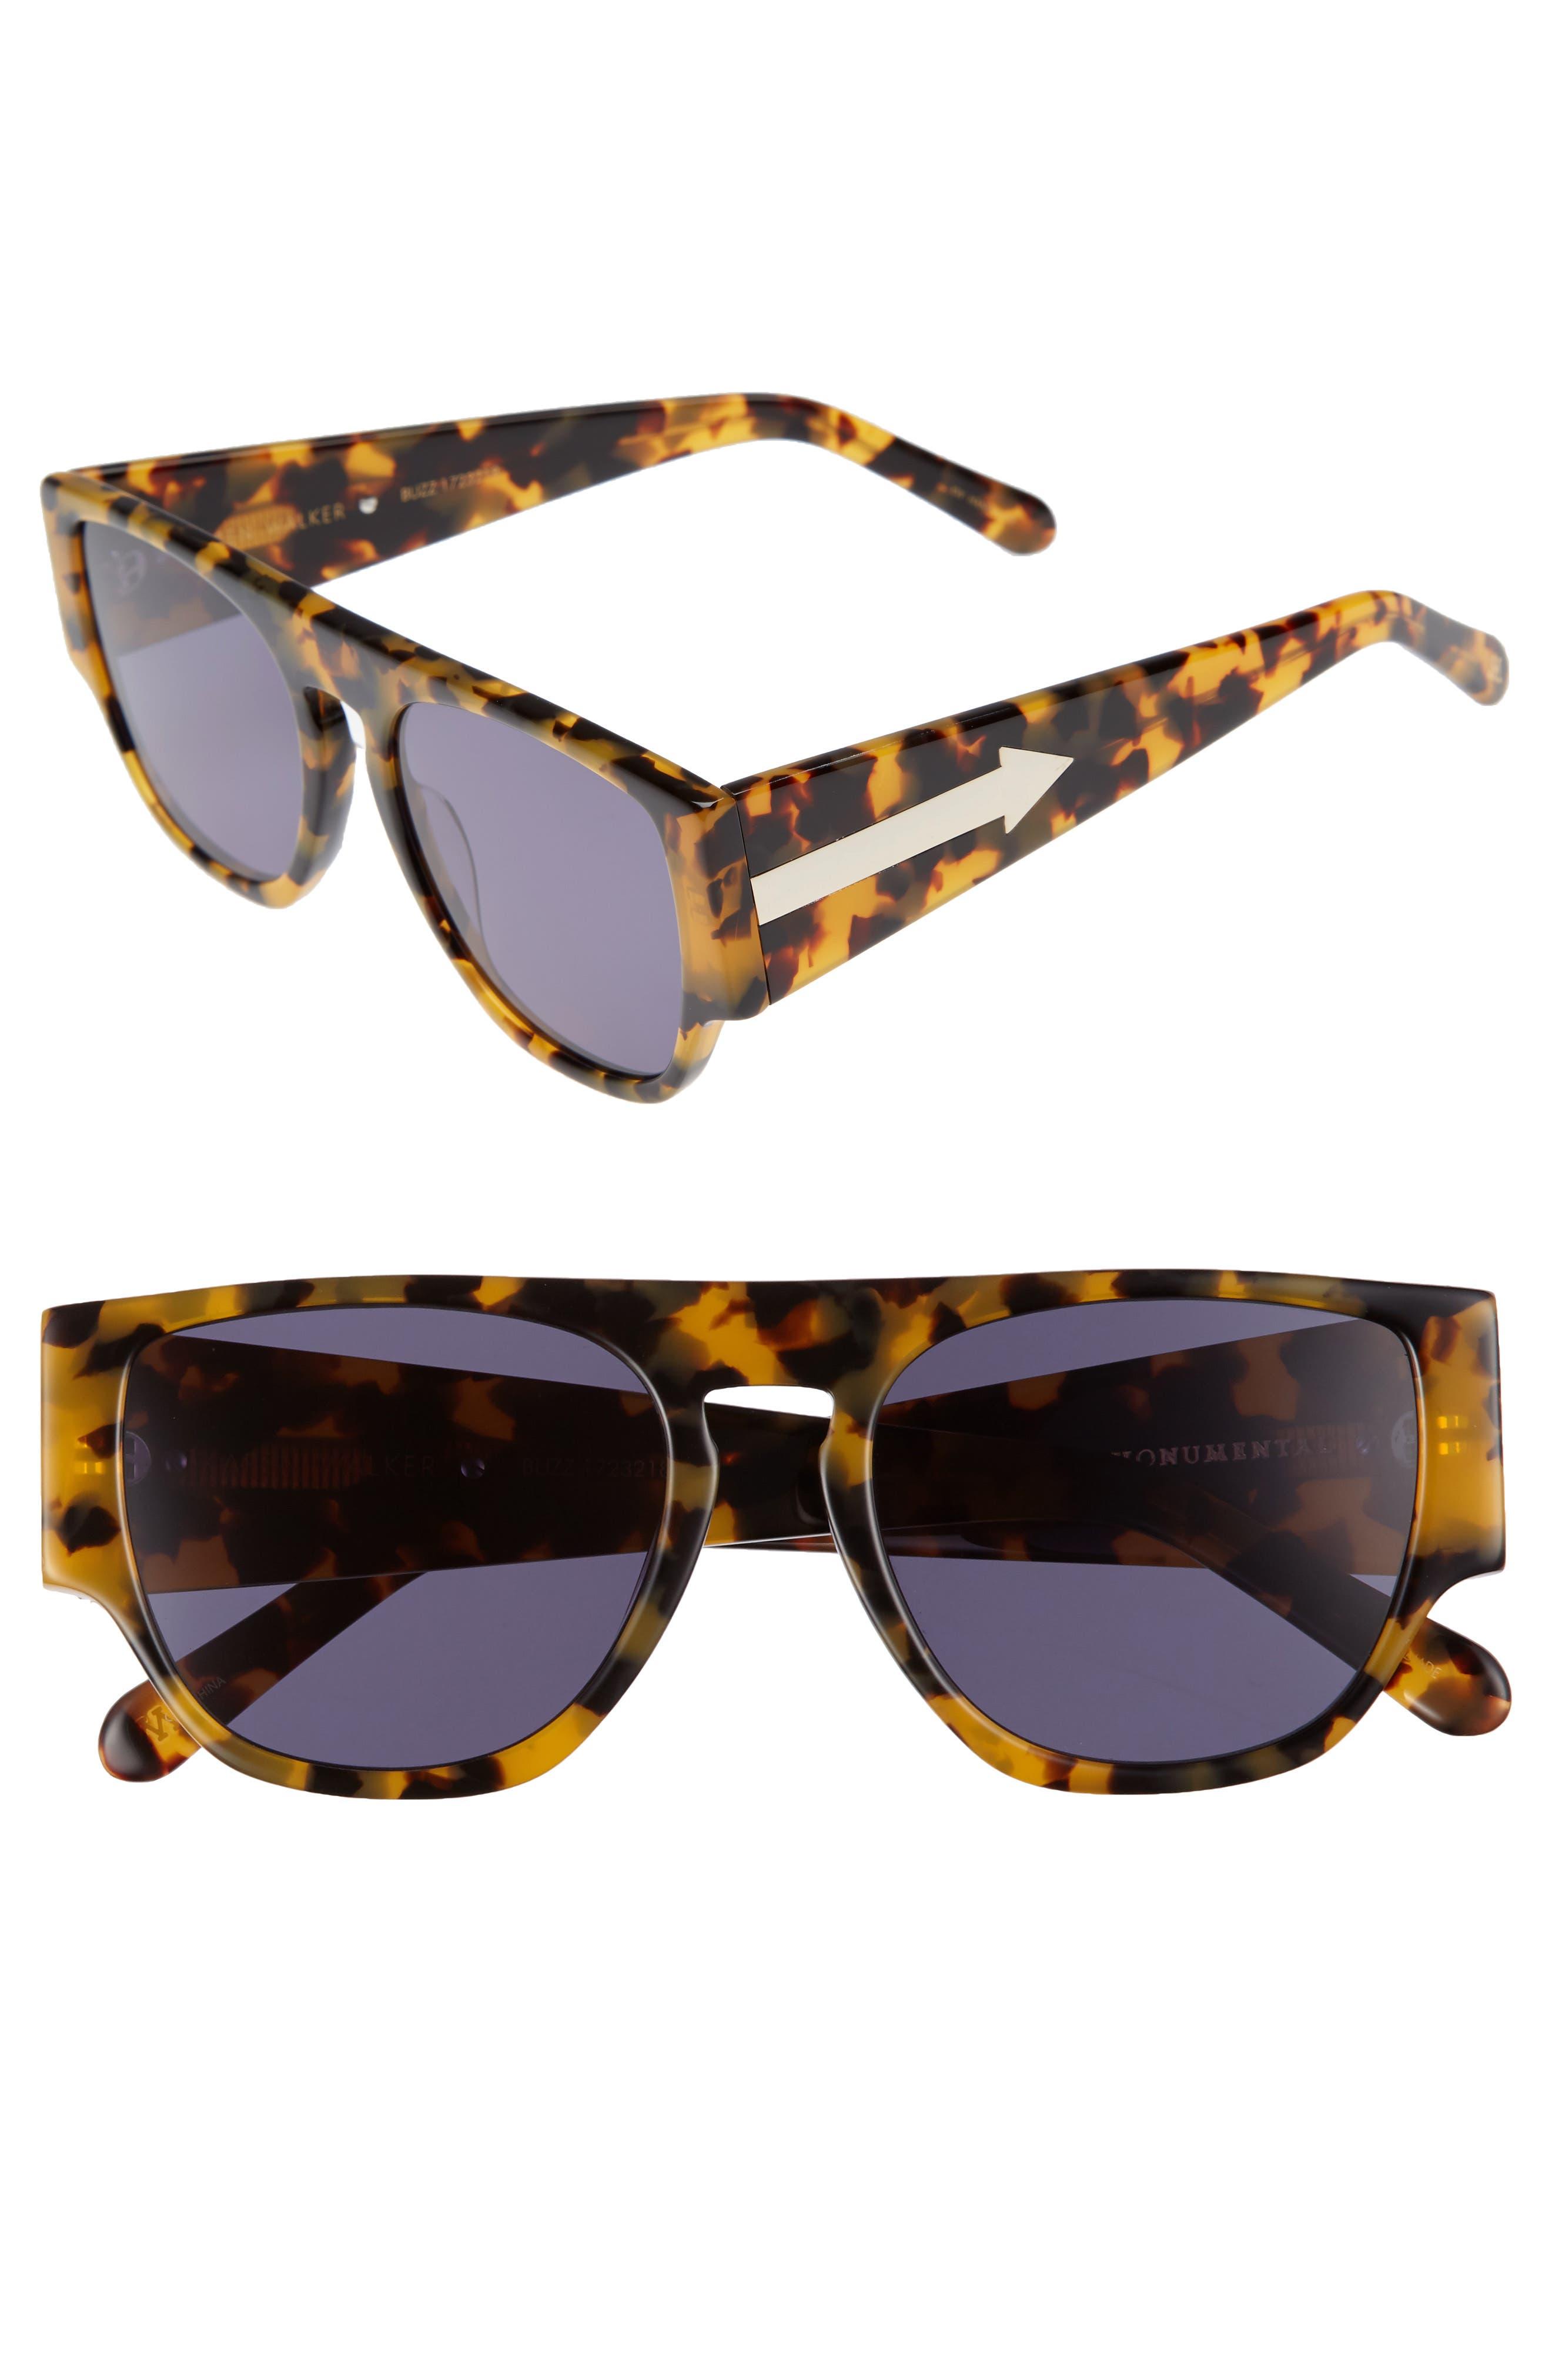 Main Image - Karen Walker x Monumental Buzz 54mm Polarized Sunglasses